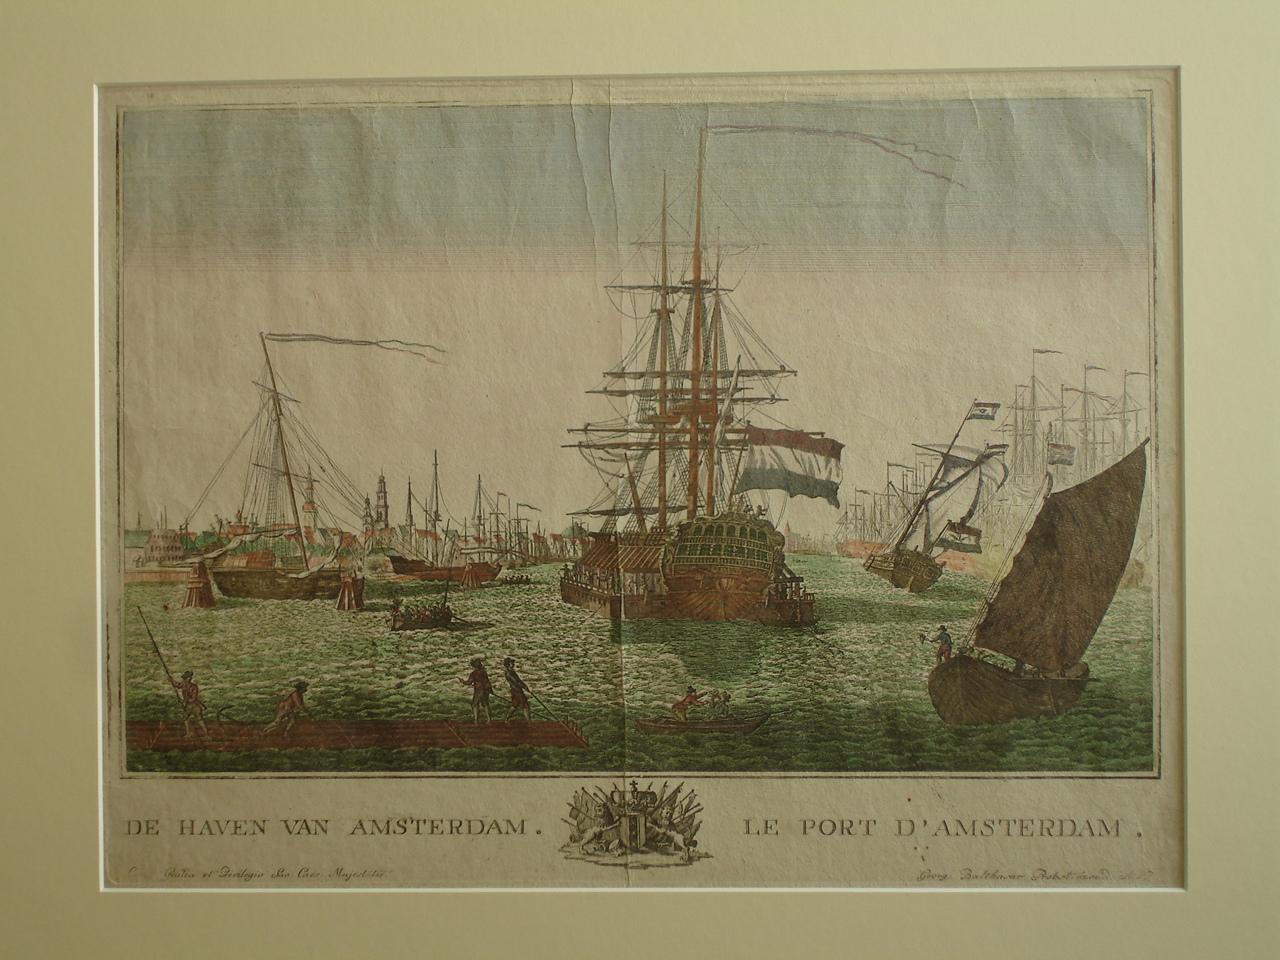 AMSTERDAM.. - De Haven van Amsterdam. Le Port D'Amsterdam.